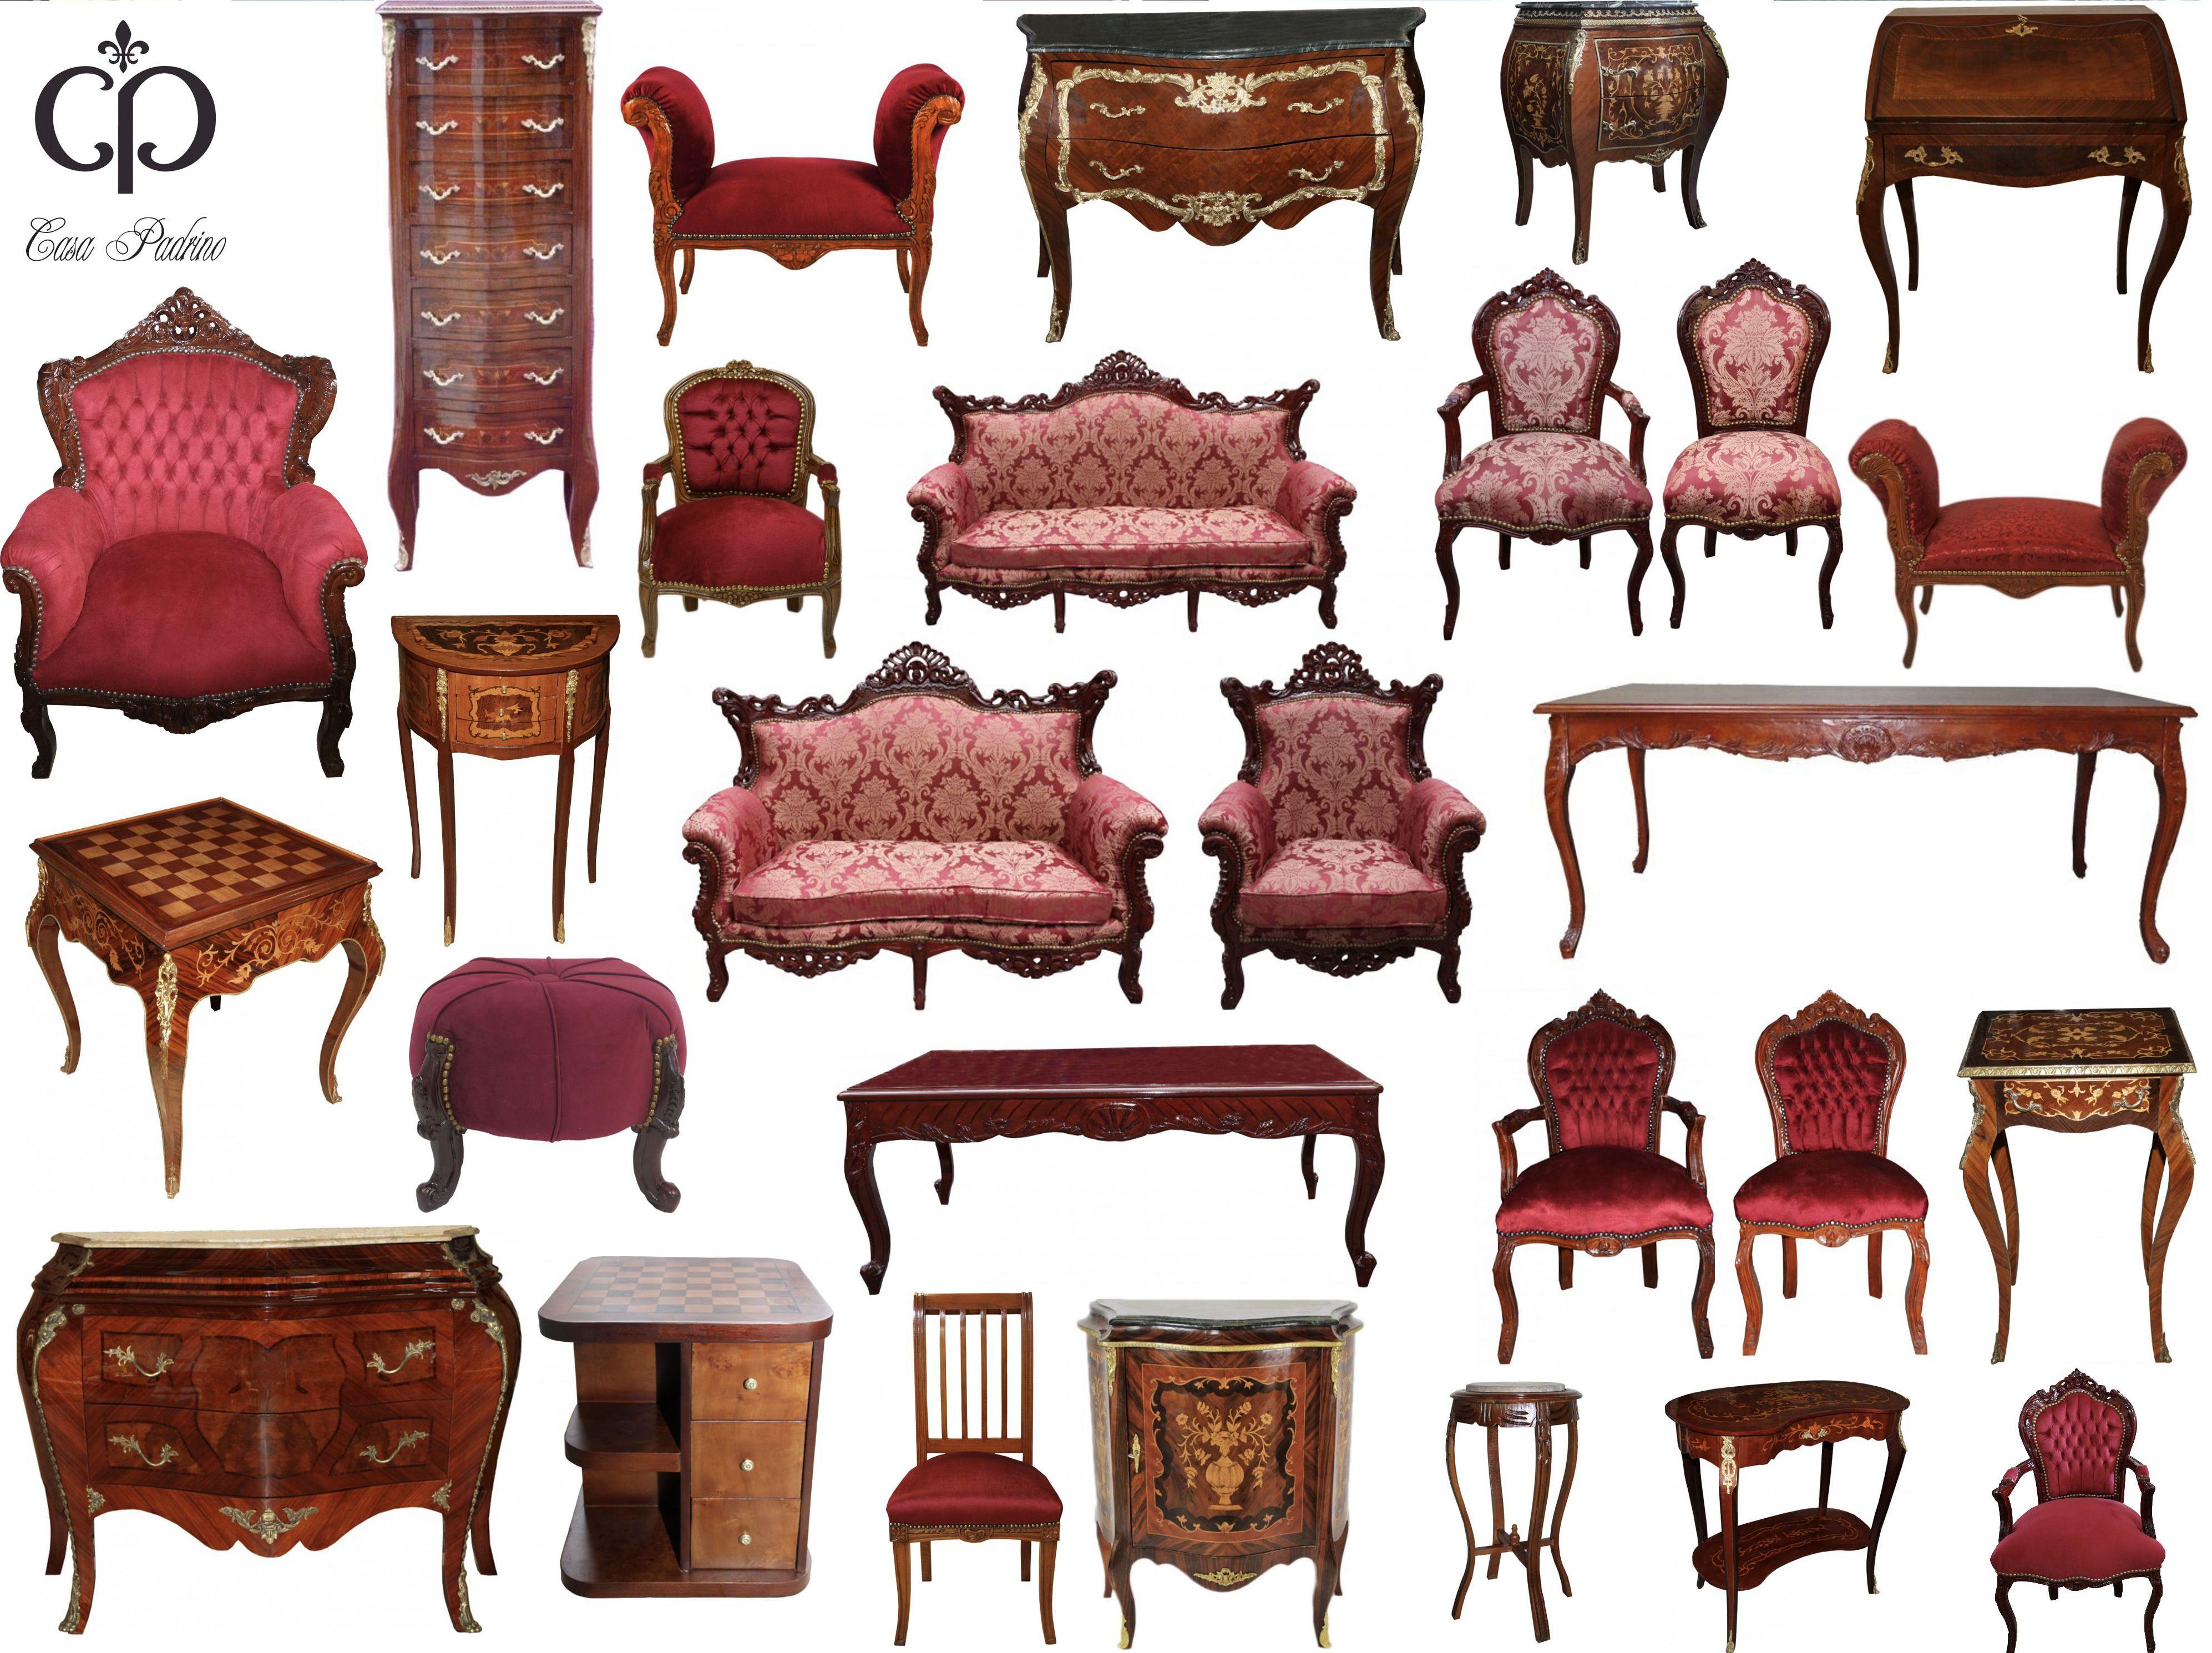 barock luxus möbel, bordeaux, braun, designer möbel, sessel, sofa, tische, Kollektion